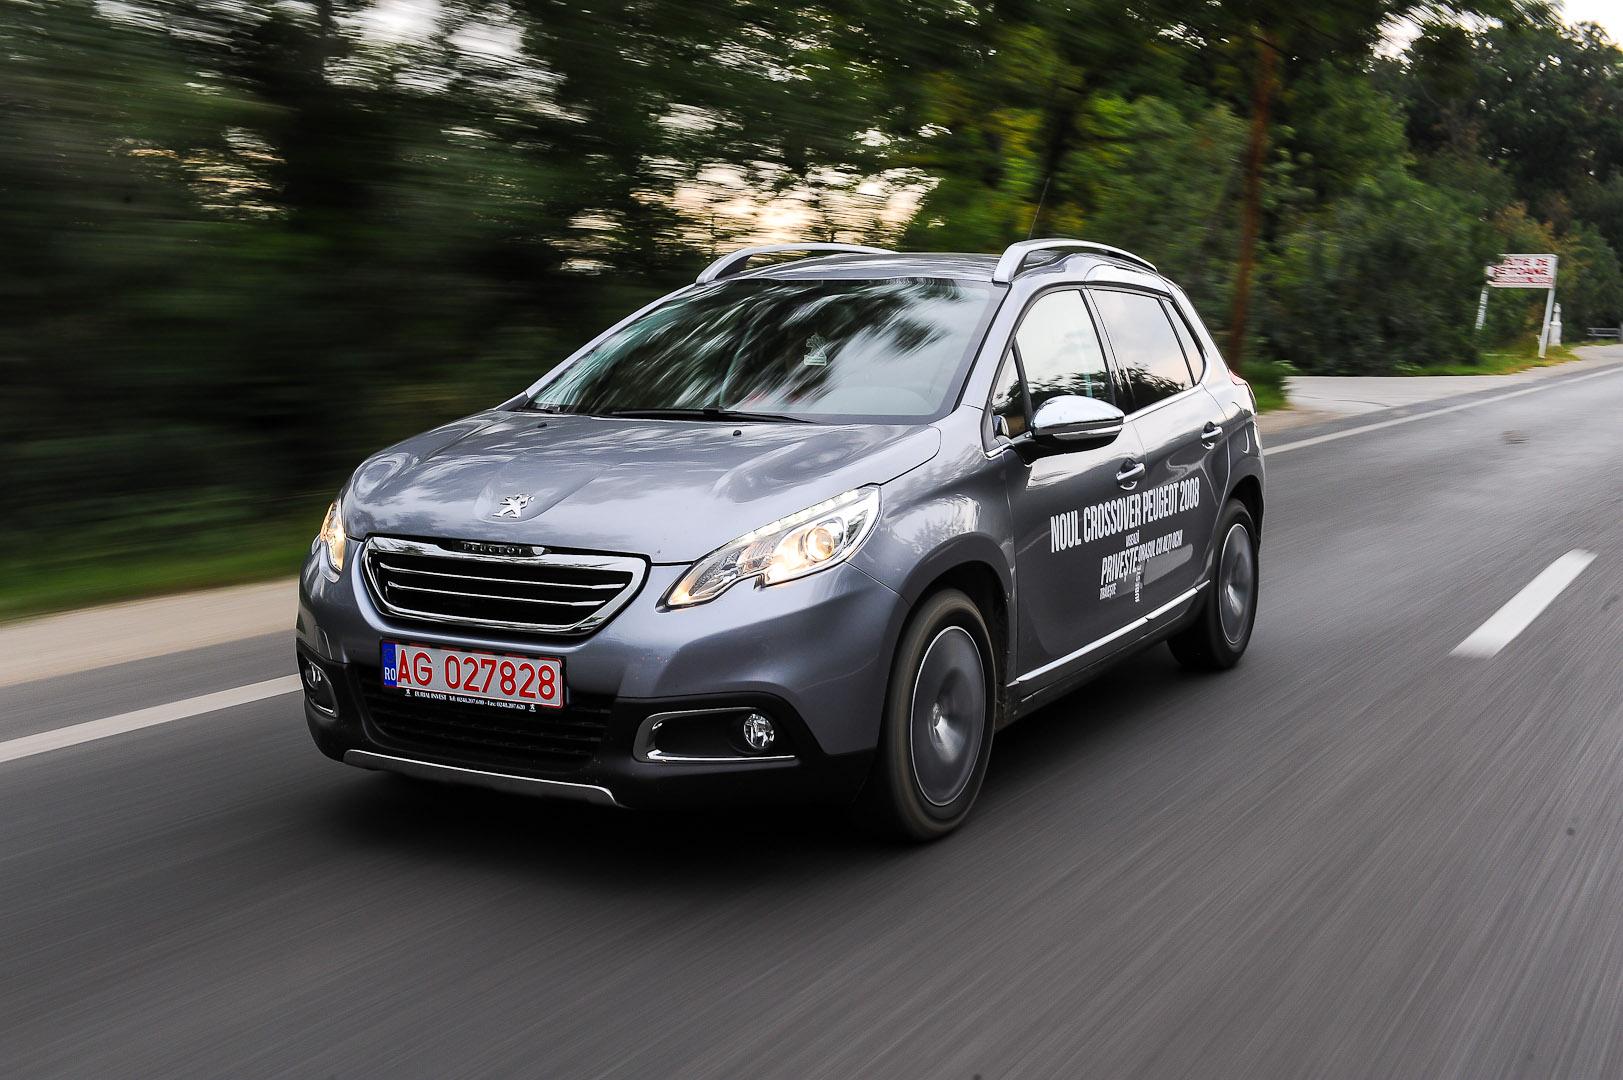 Prima impresie: Peugeot 2008 – 1.6 e-Hdi 92 cp